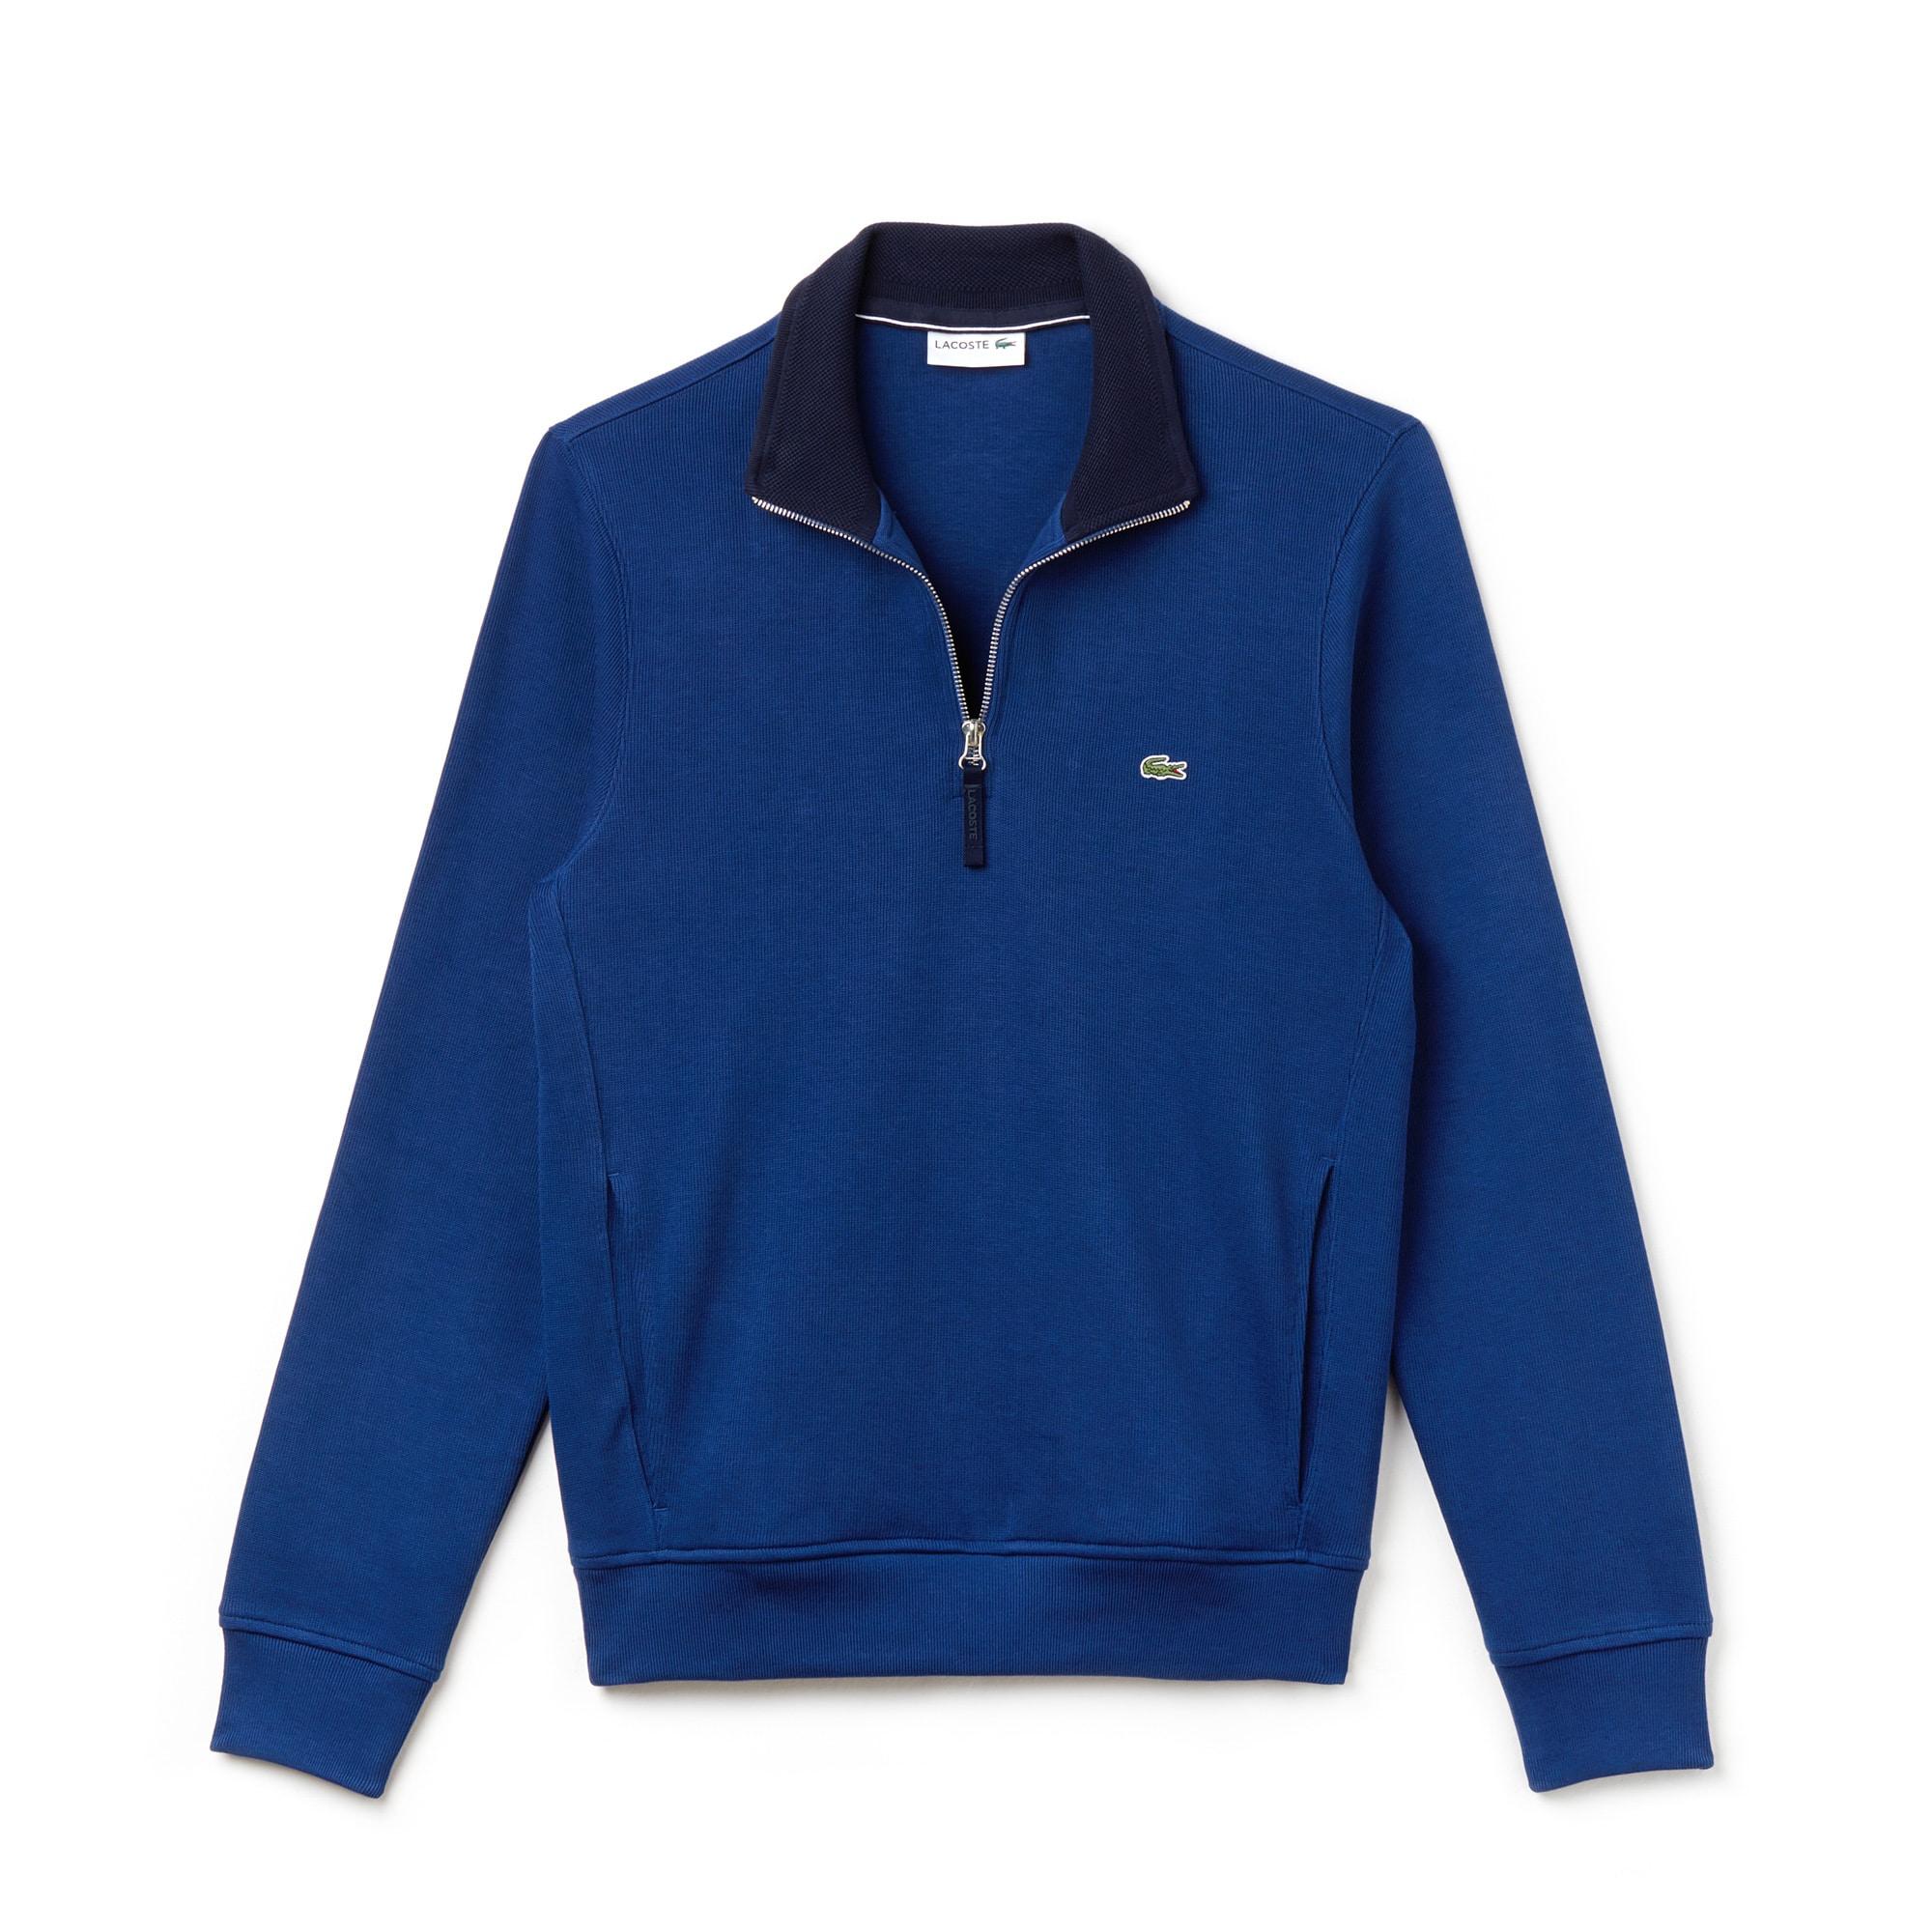 Men's Stand-Up Collar Ribbed Sweatshirt